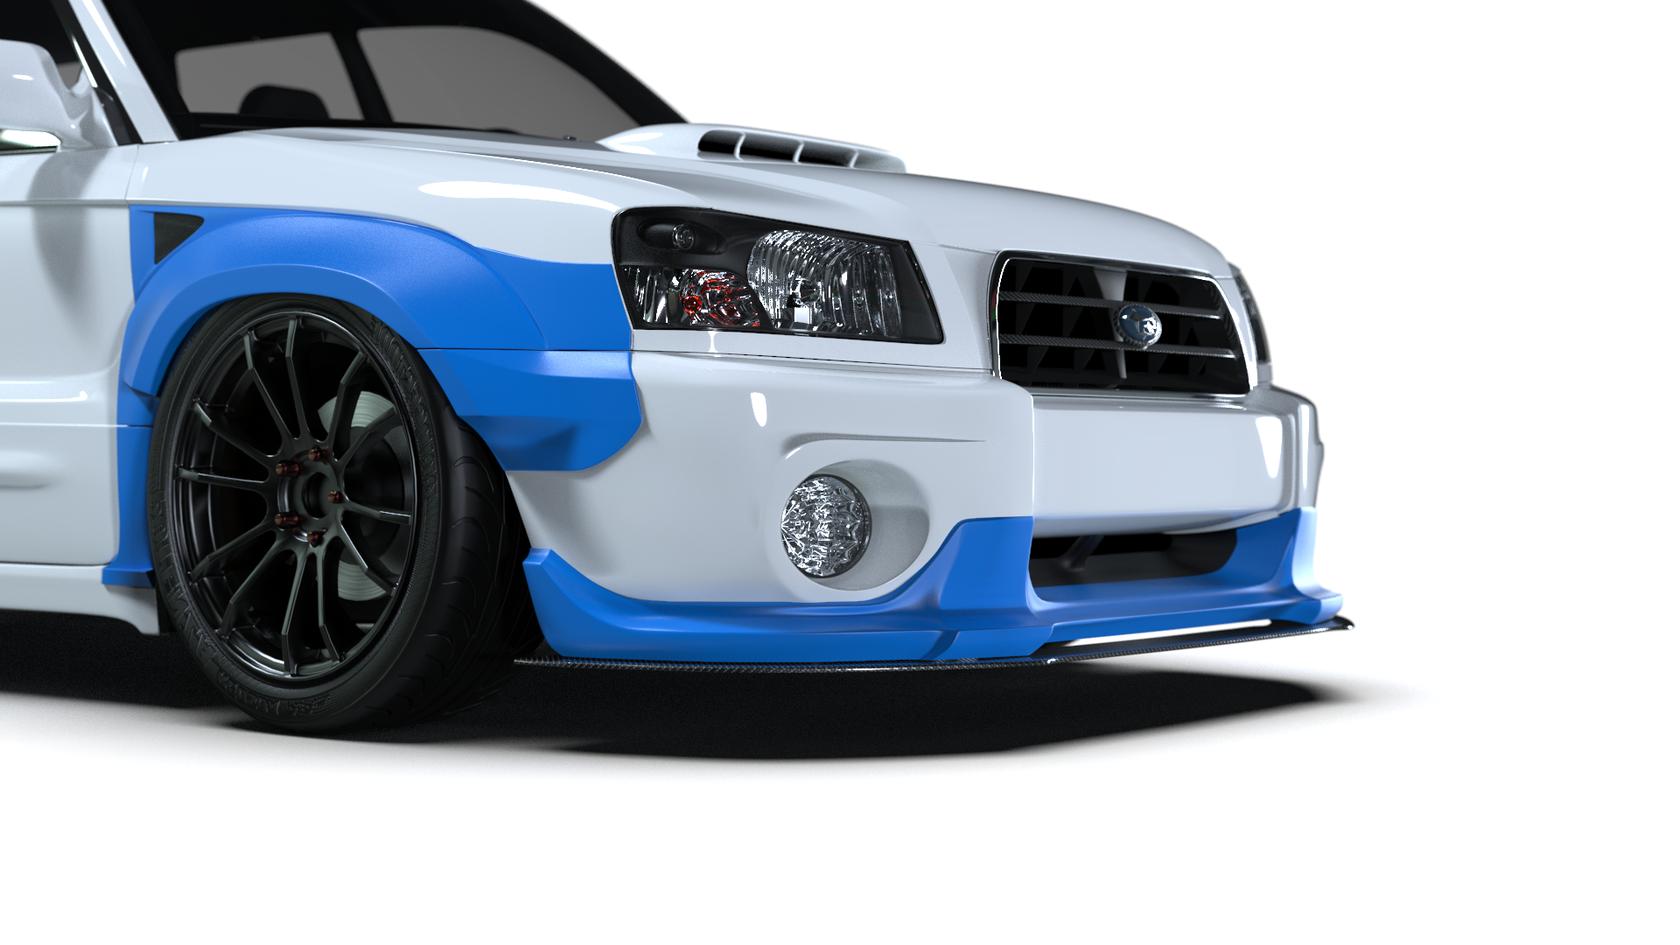 Carbon Fiber Rear Window Roof Spoiler For 2008 2013 Subaru Impreza 5dr Sti Subaru Impreza Impreza Subaru